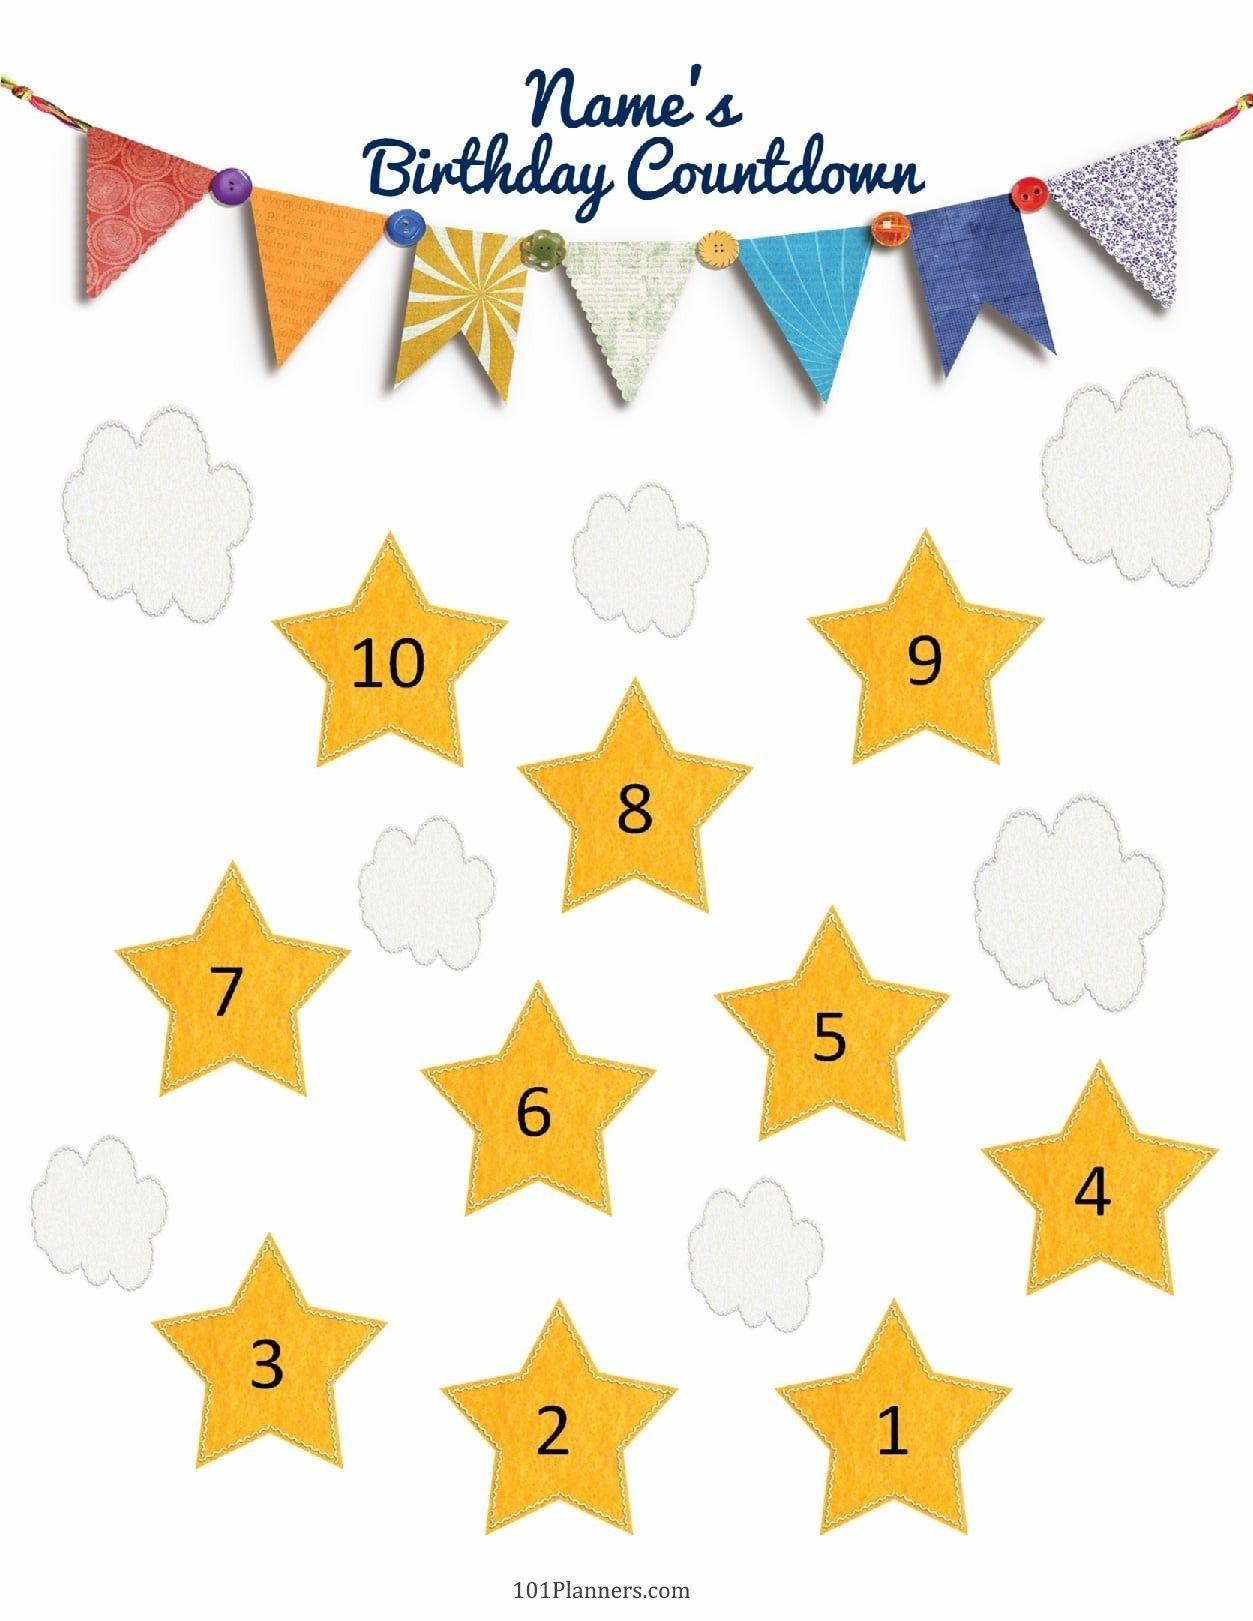 Birthday Countdown Print Example Calendar Printable